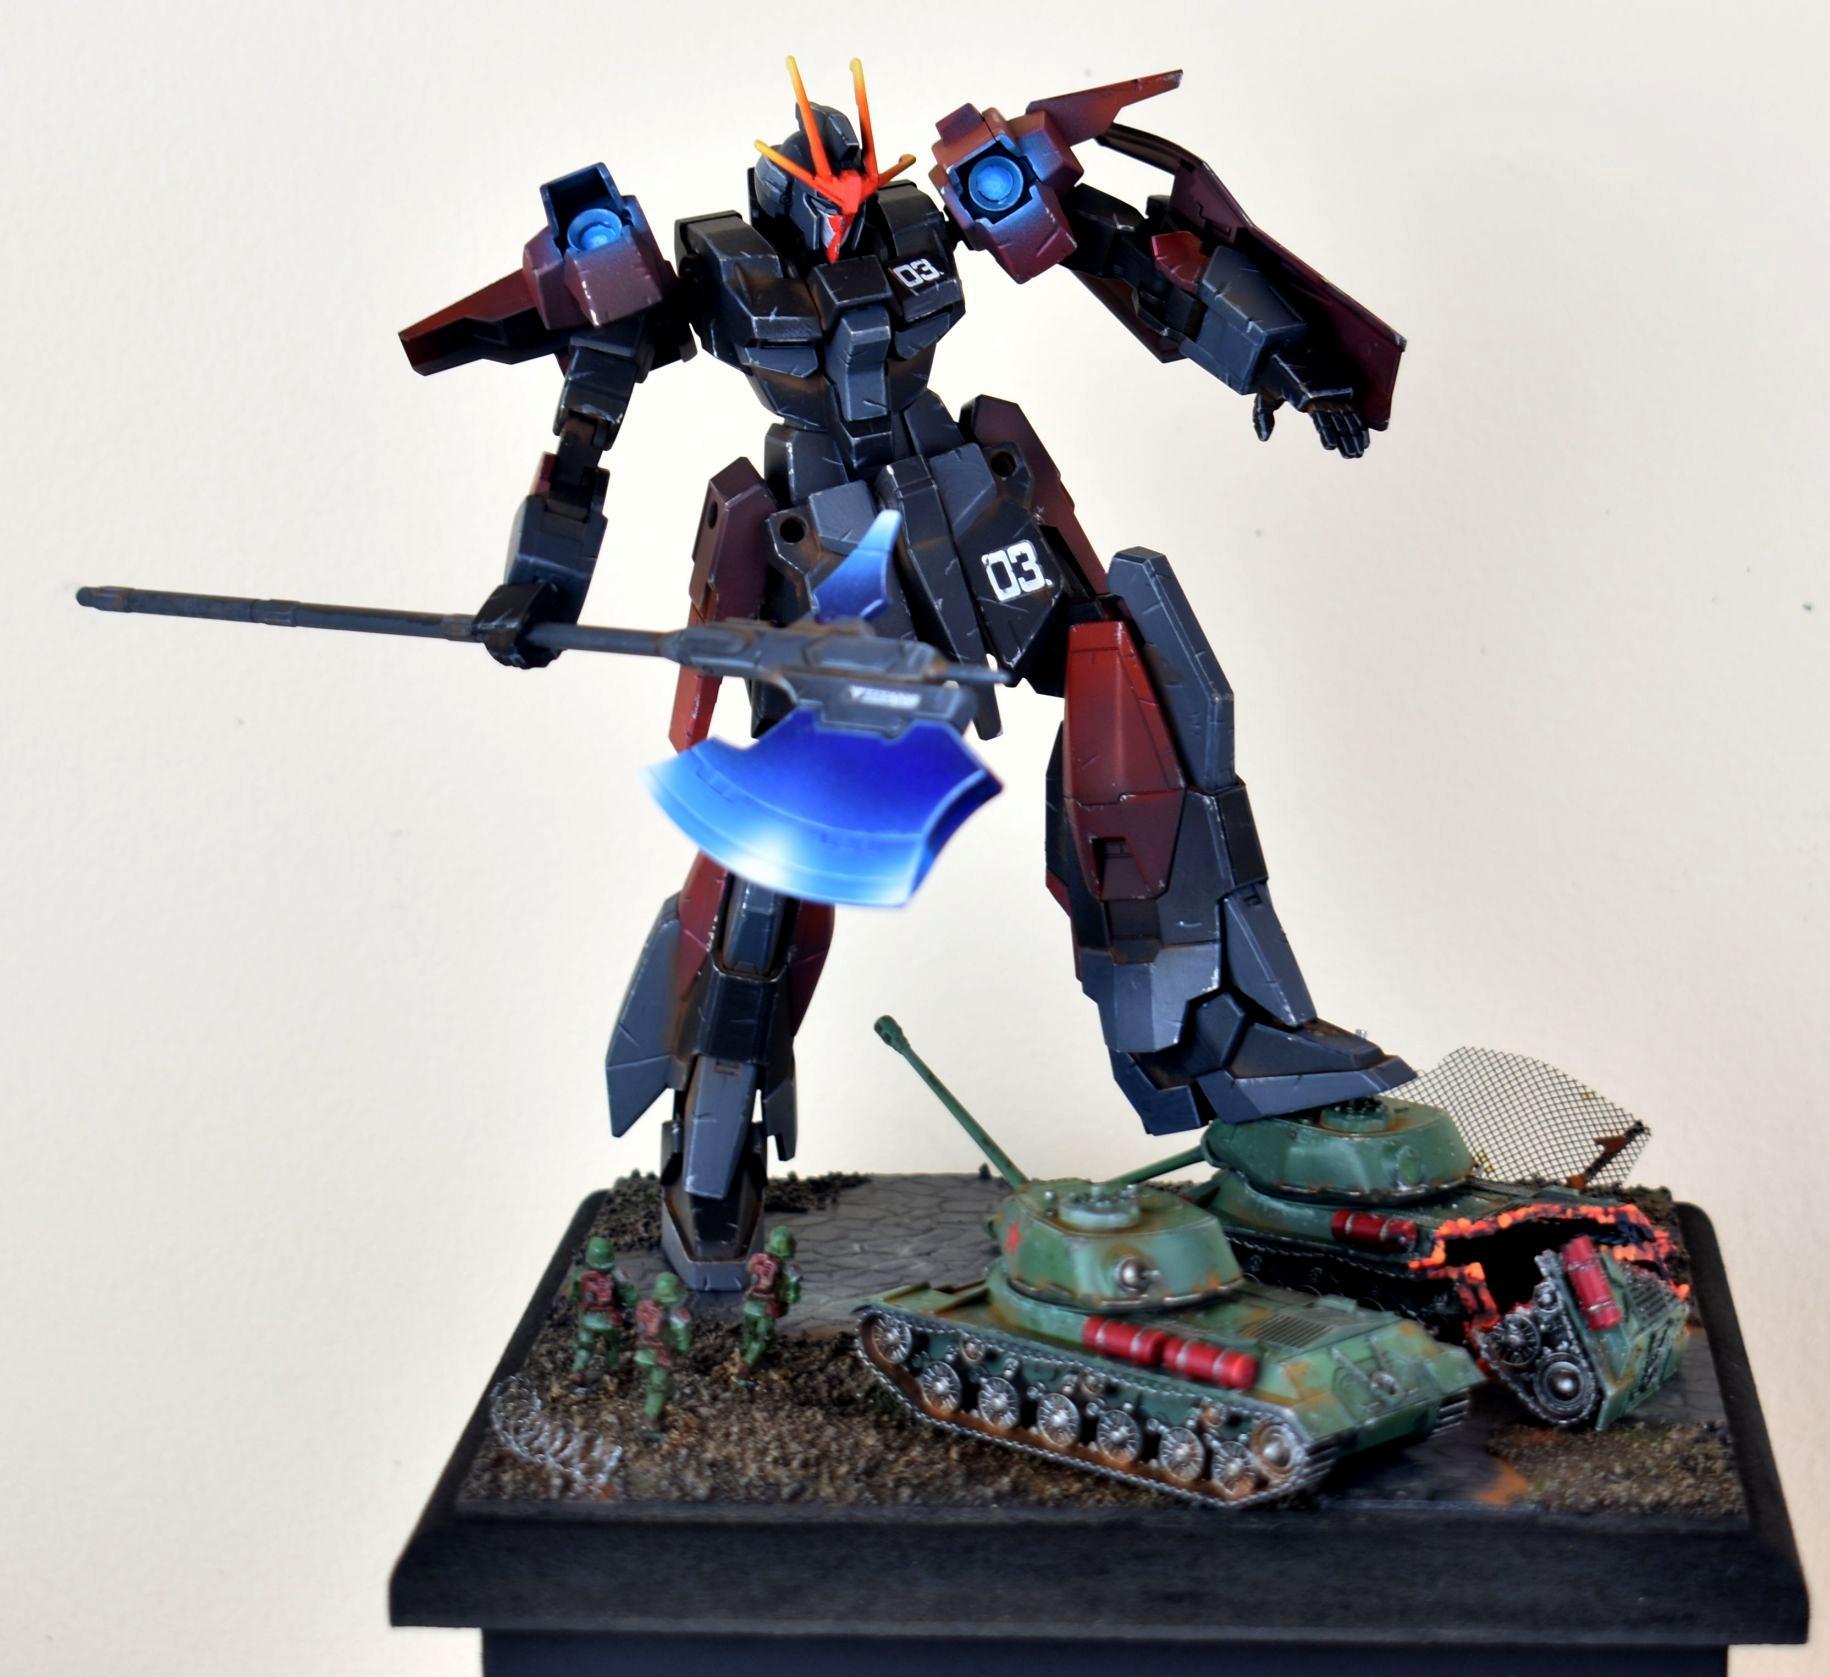 Diorama, Gundam, Object Source Lighting, Robotech